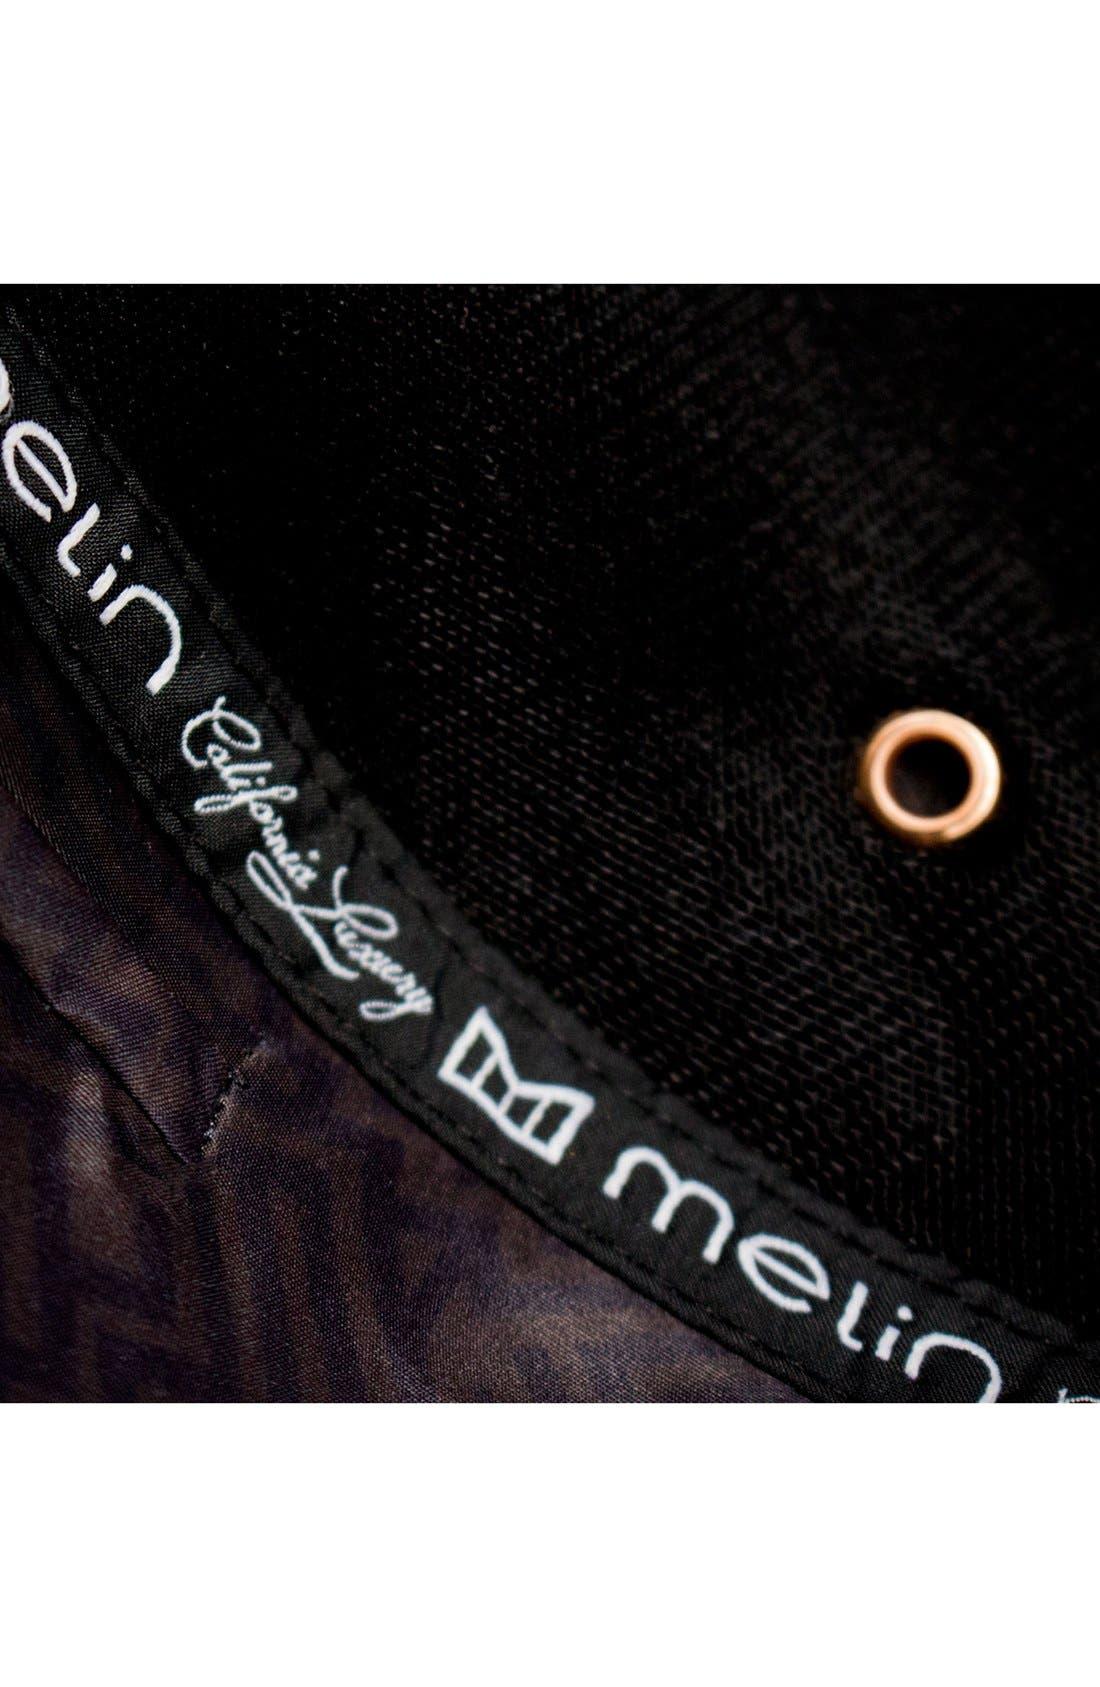 'The Majesty' Mesh Back Snapback Hat,                             Alternate thumbnail 9, color,                             Black